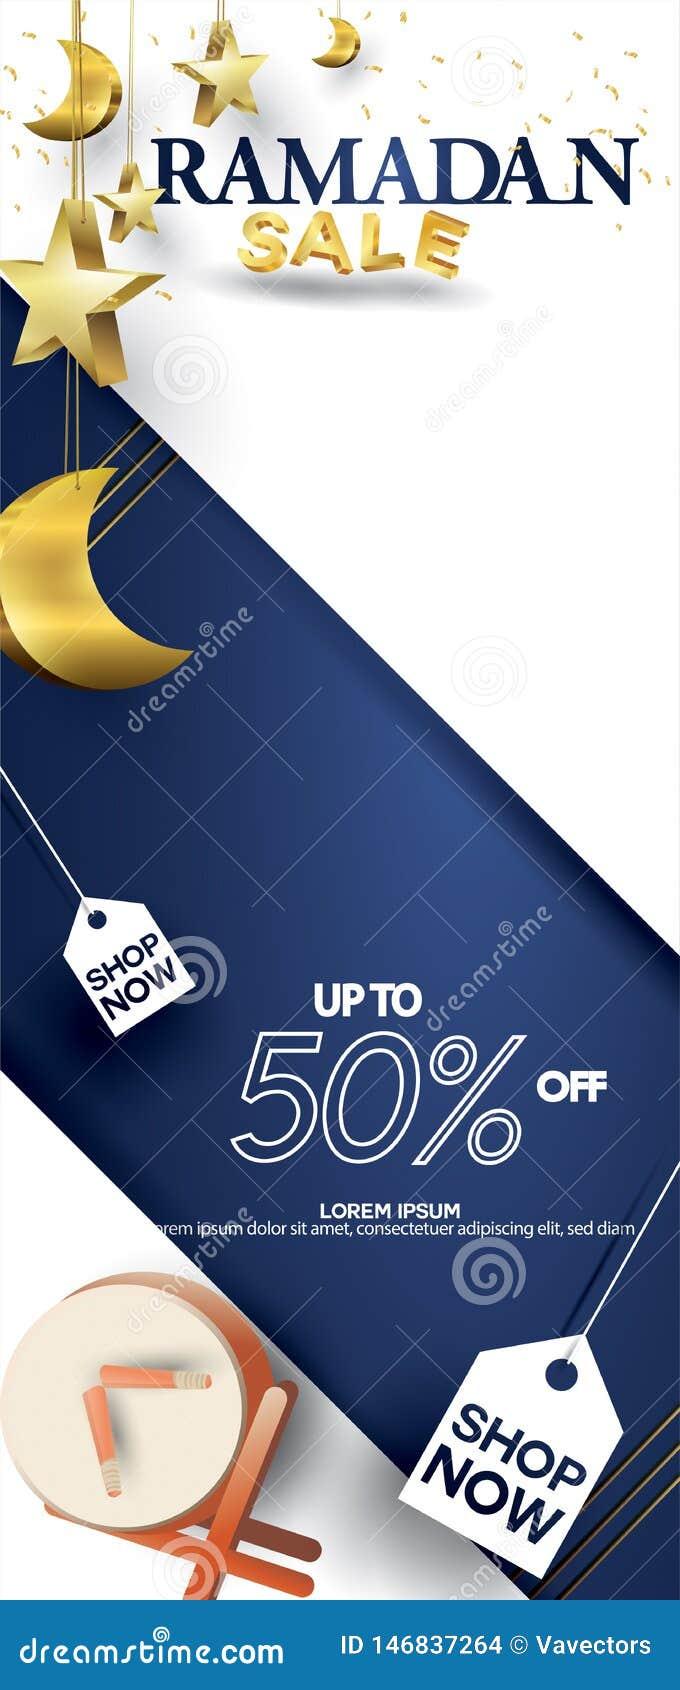 05c1aeb9f3 Eid Mubarak Or Ramadan Kareem For Roll Banner, X Banner, Or Roll Up ...